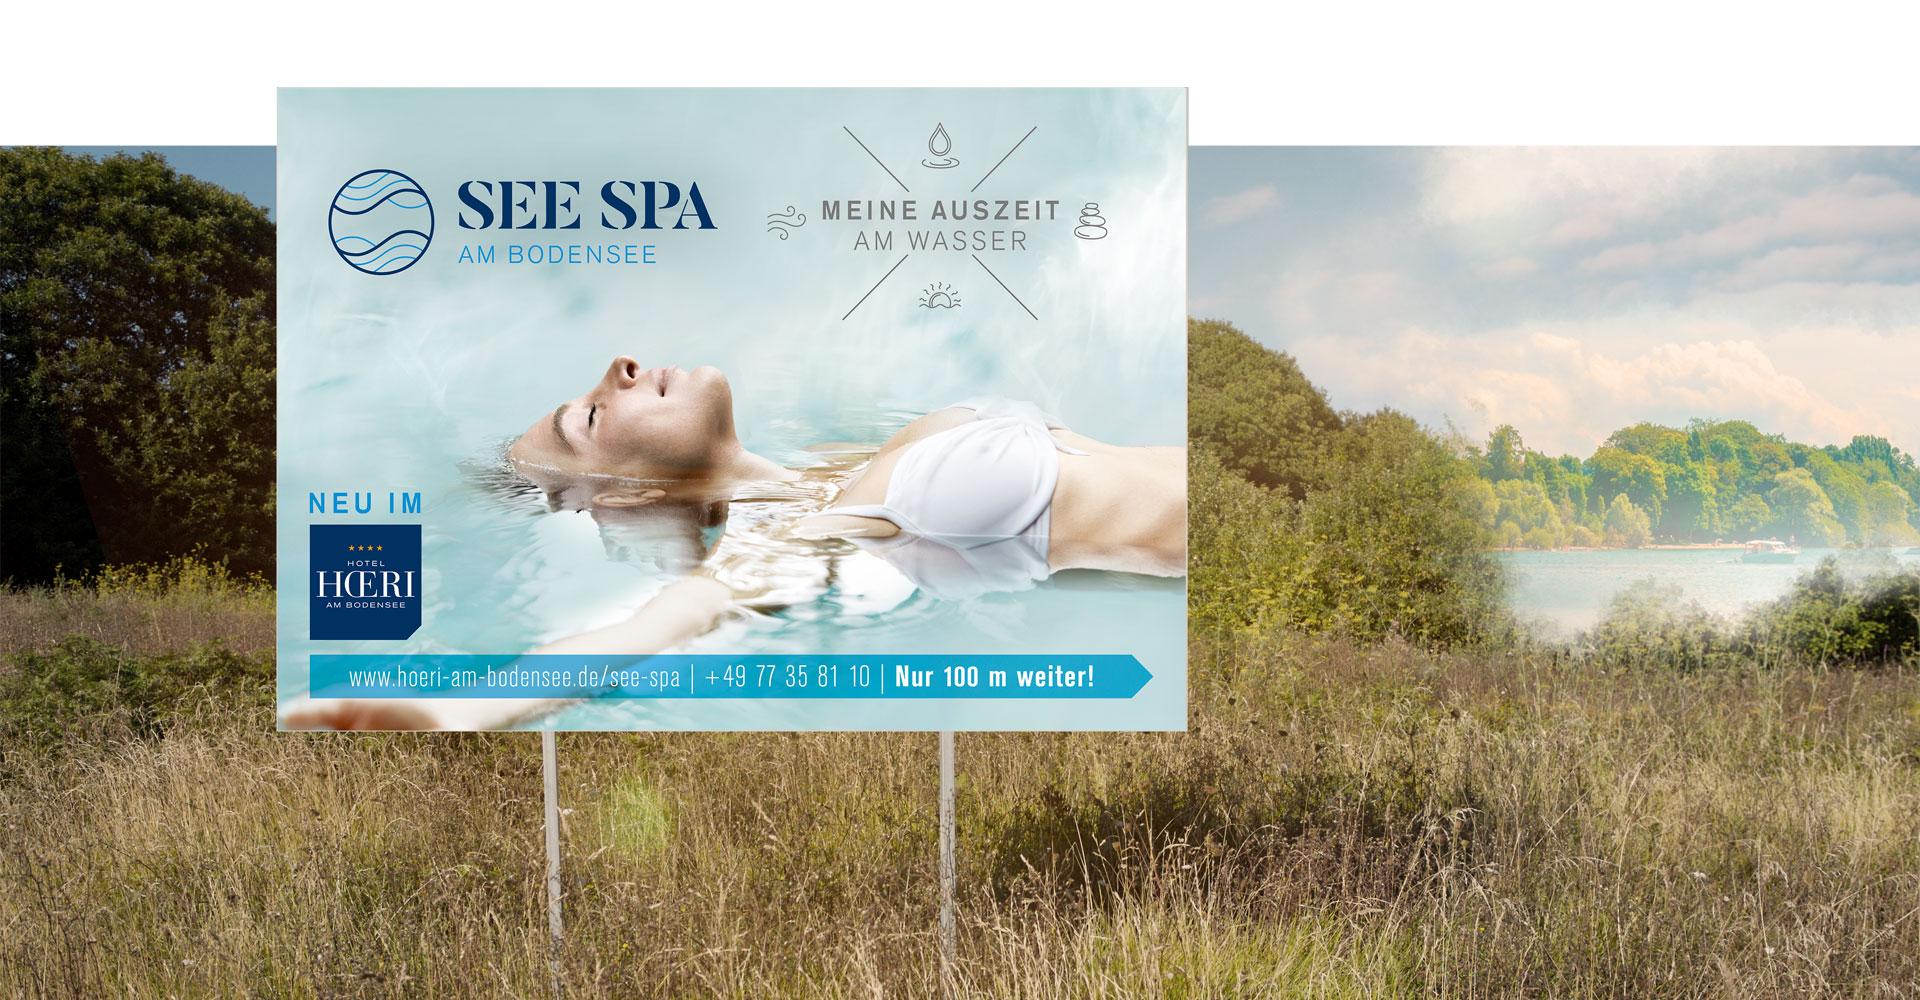 OPUS Marketing / Projekte / Hotel Hoeri am Bodensee / Großflächenwerbung / Plakat